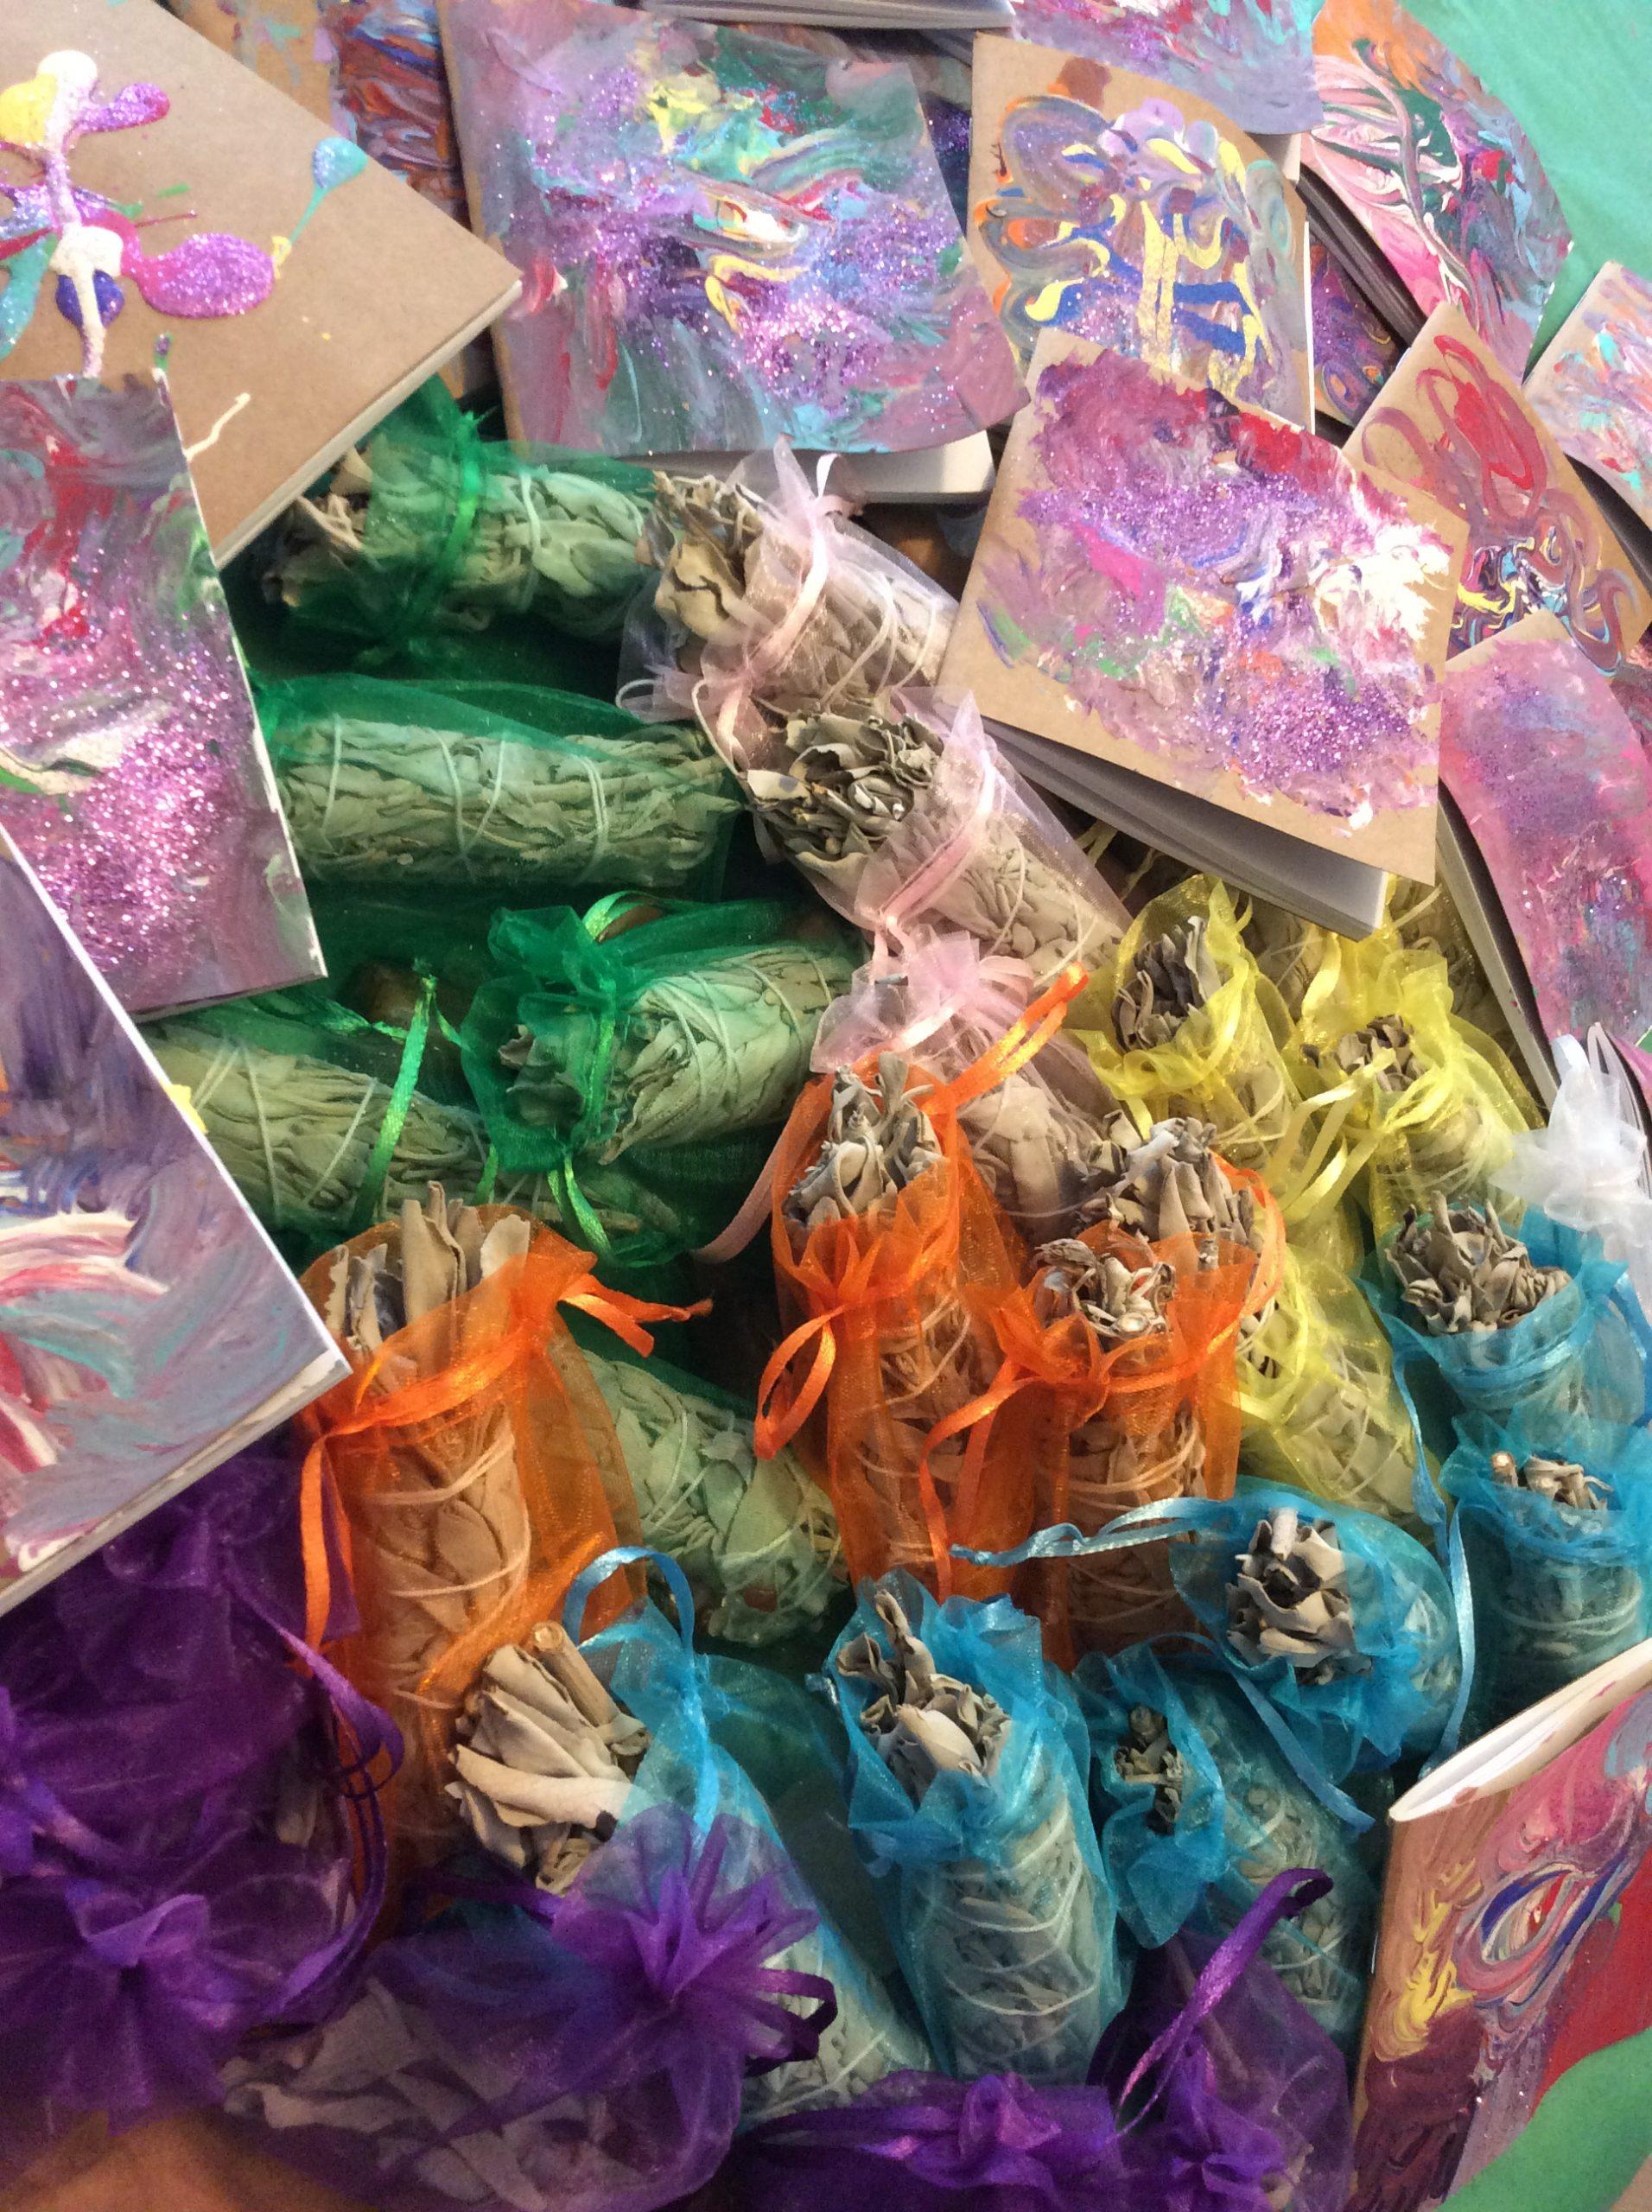 Healing Kit With Sage, Palo Santo, & Crystals